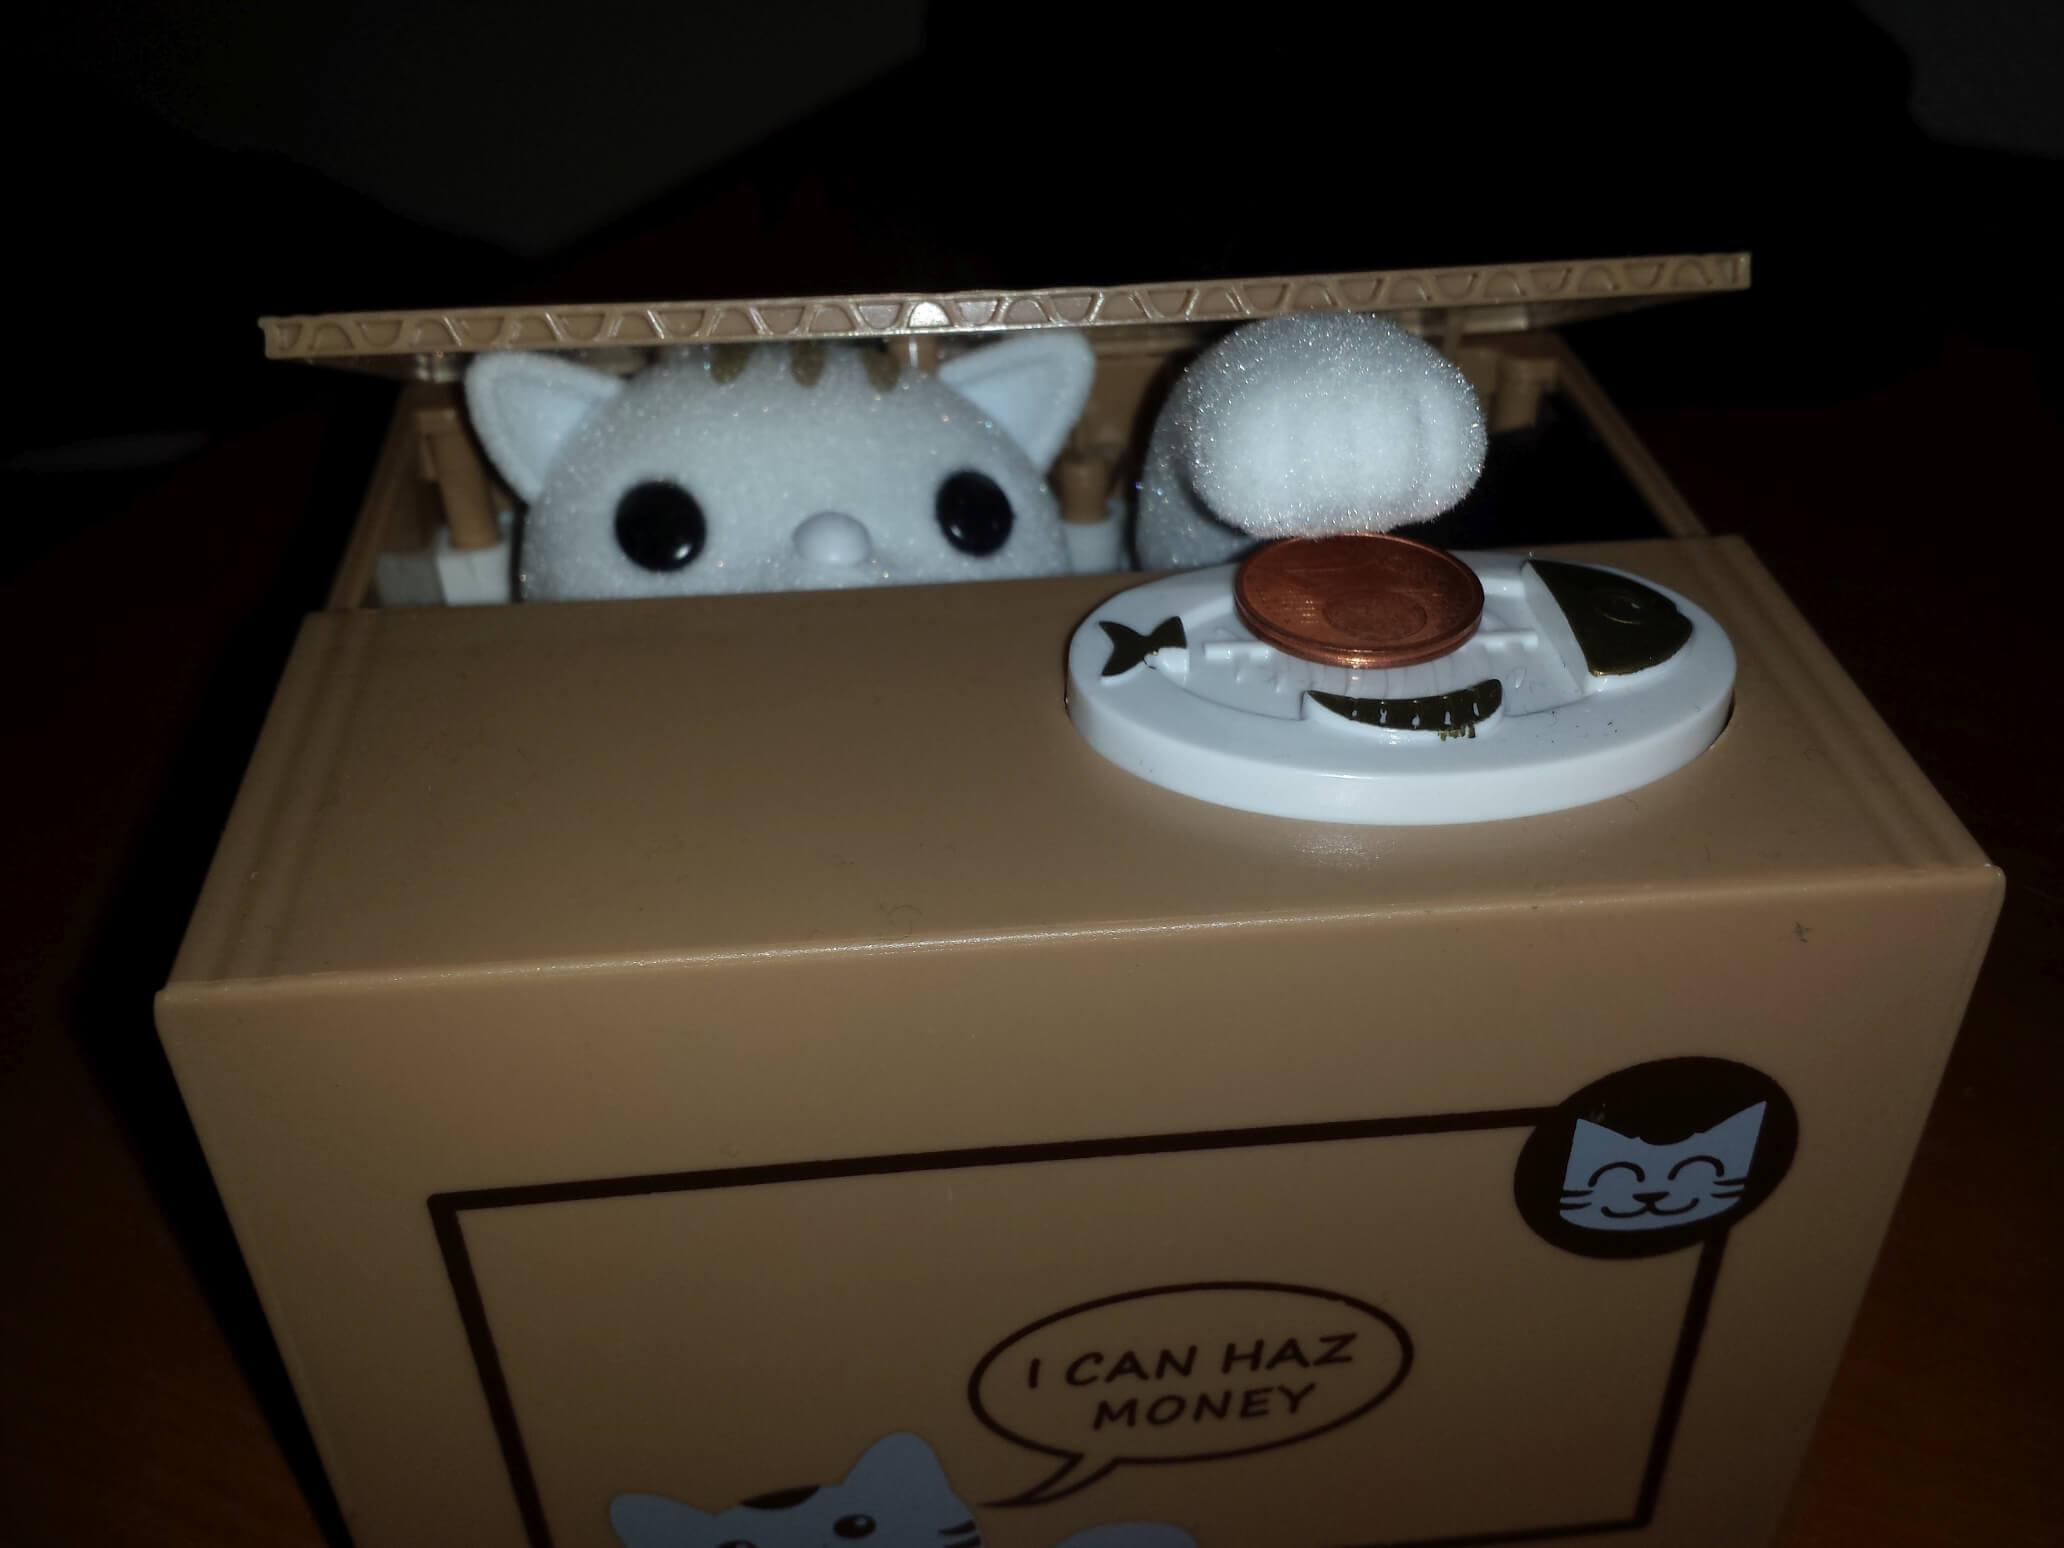 Katzenspardose I can haz money Spieldosen